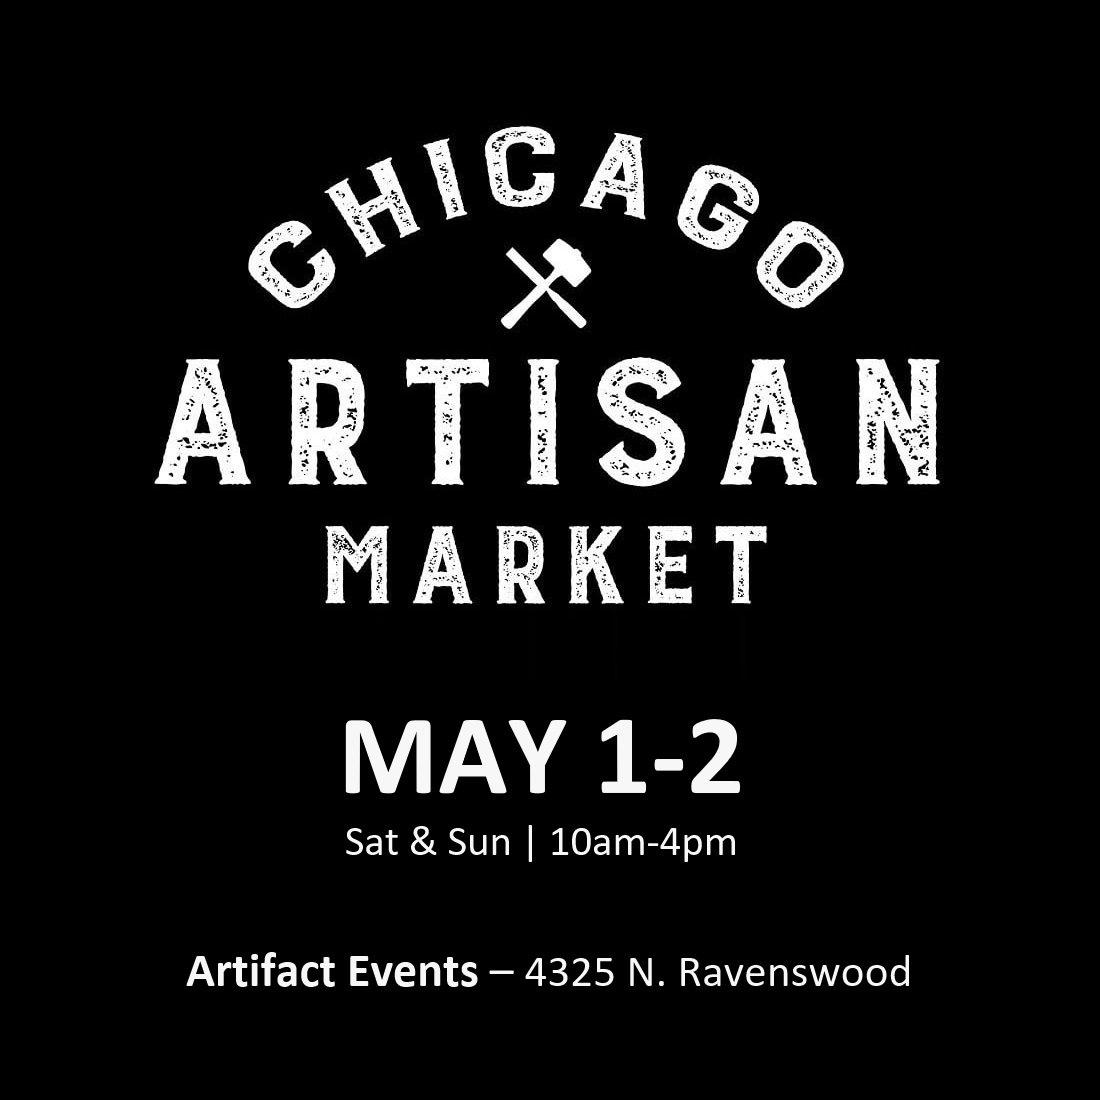 Chicago Artisan Market - May 1-2, 2021 at Artifact Events